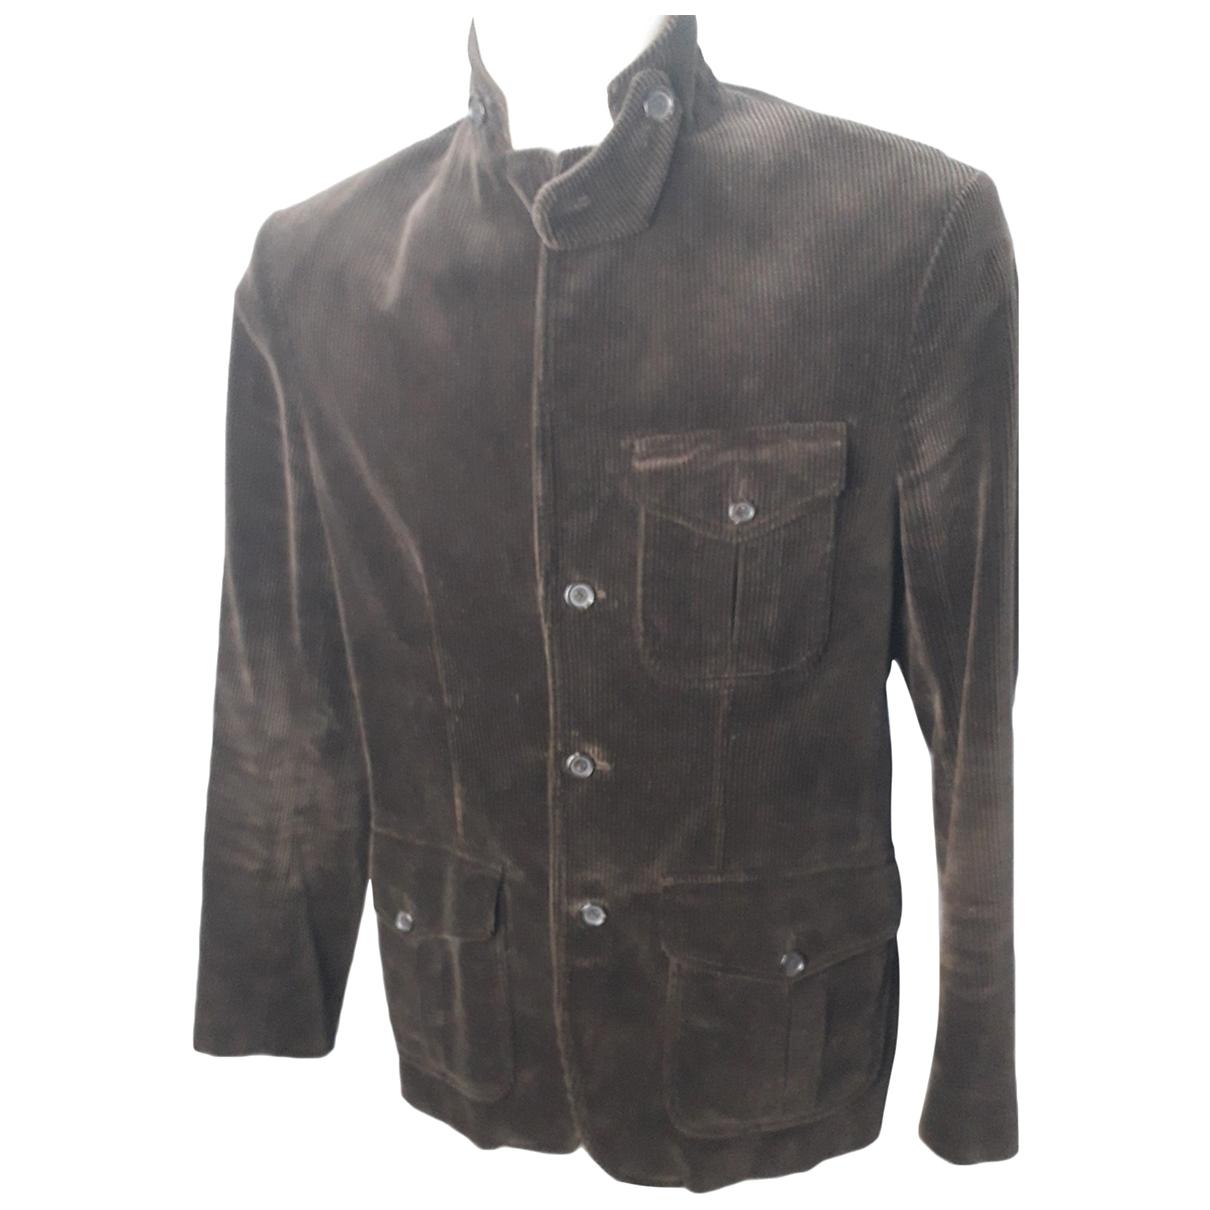 Polo Ralph Lauren \N Brown Cotton jacket  for Men M International